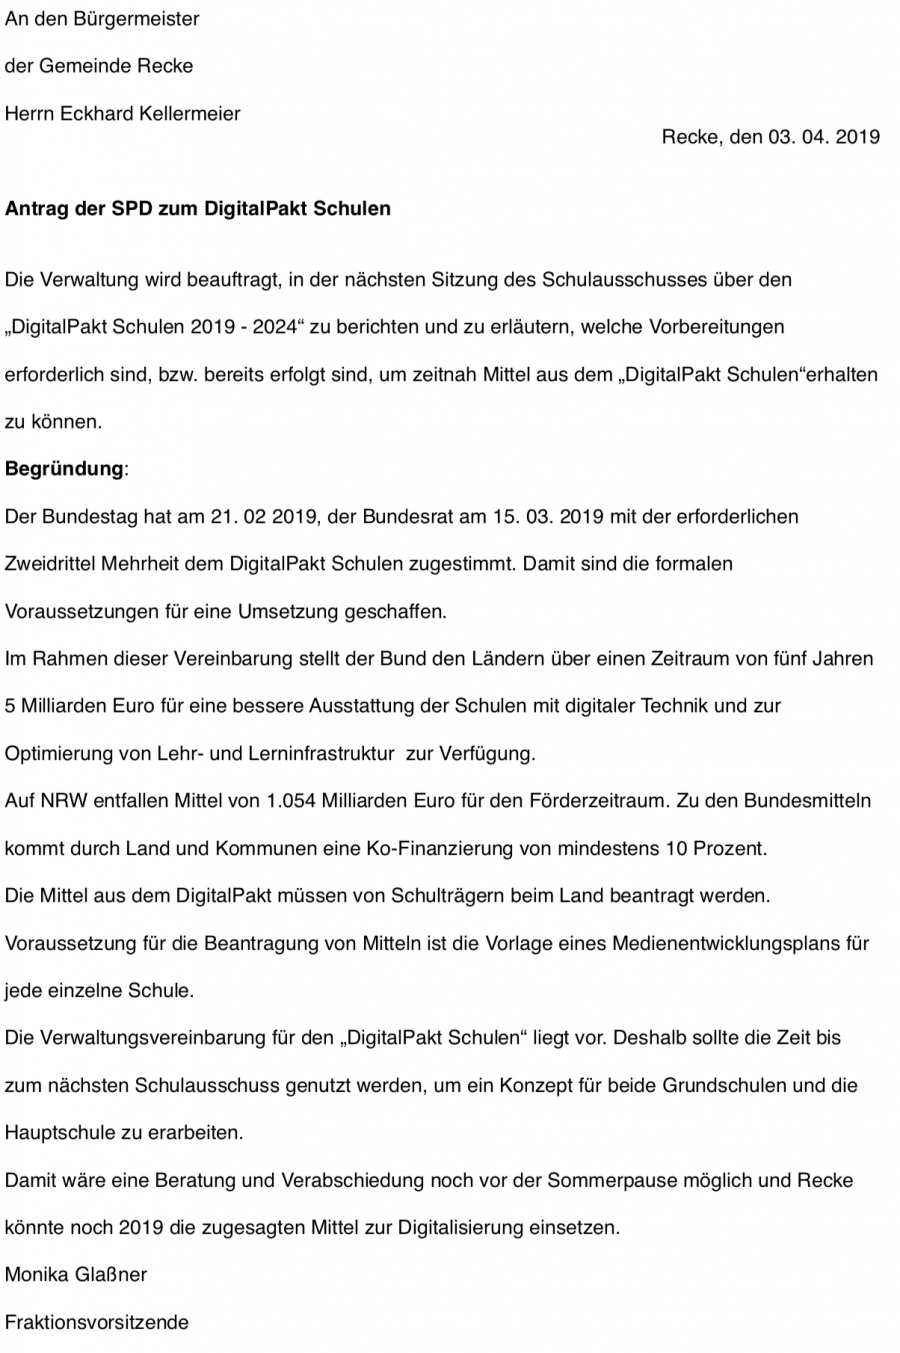 Antrag der SPD zum DigitalPakt Schulen